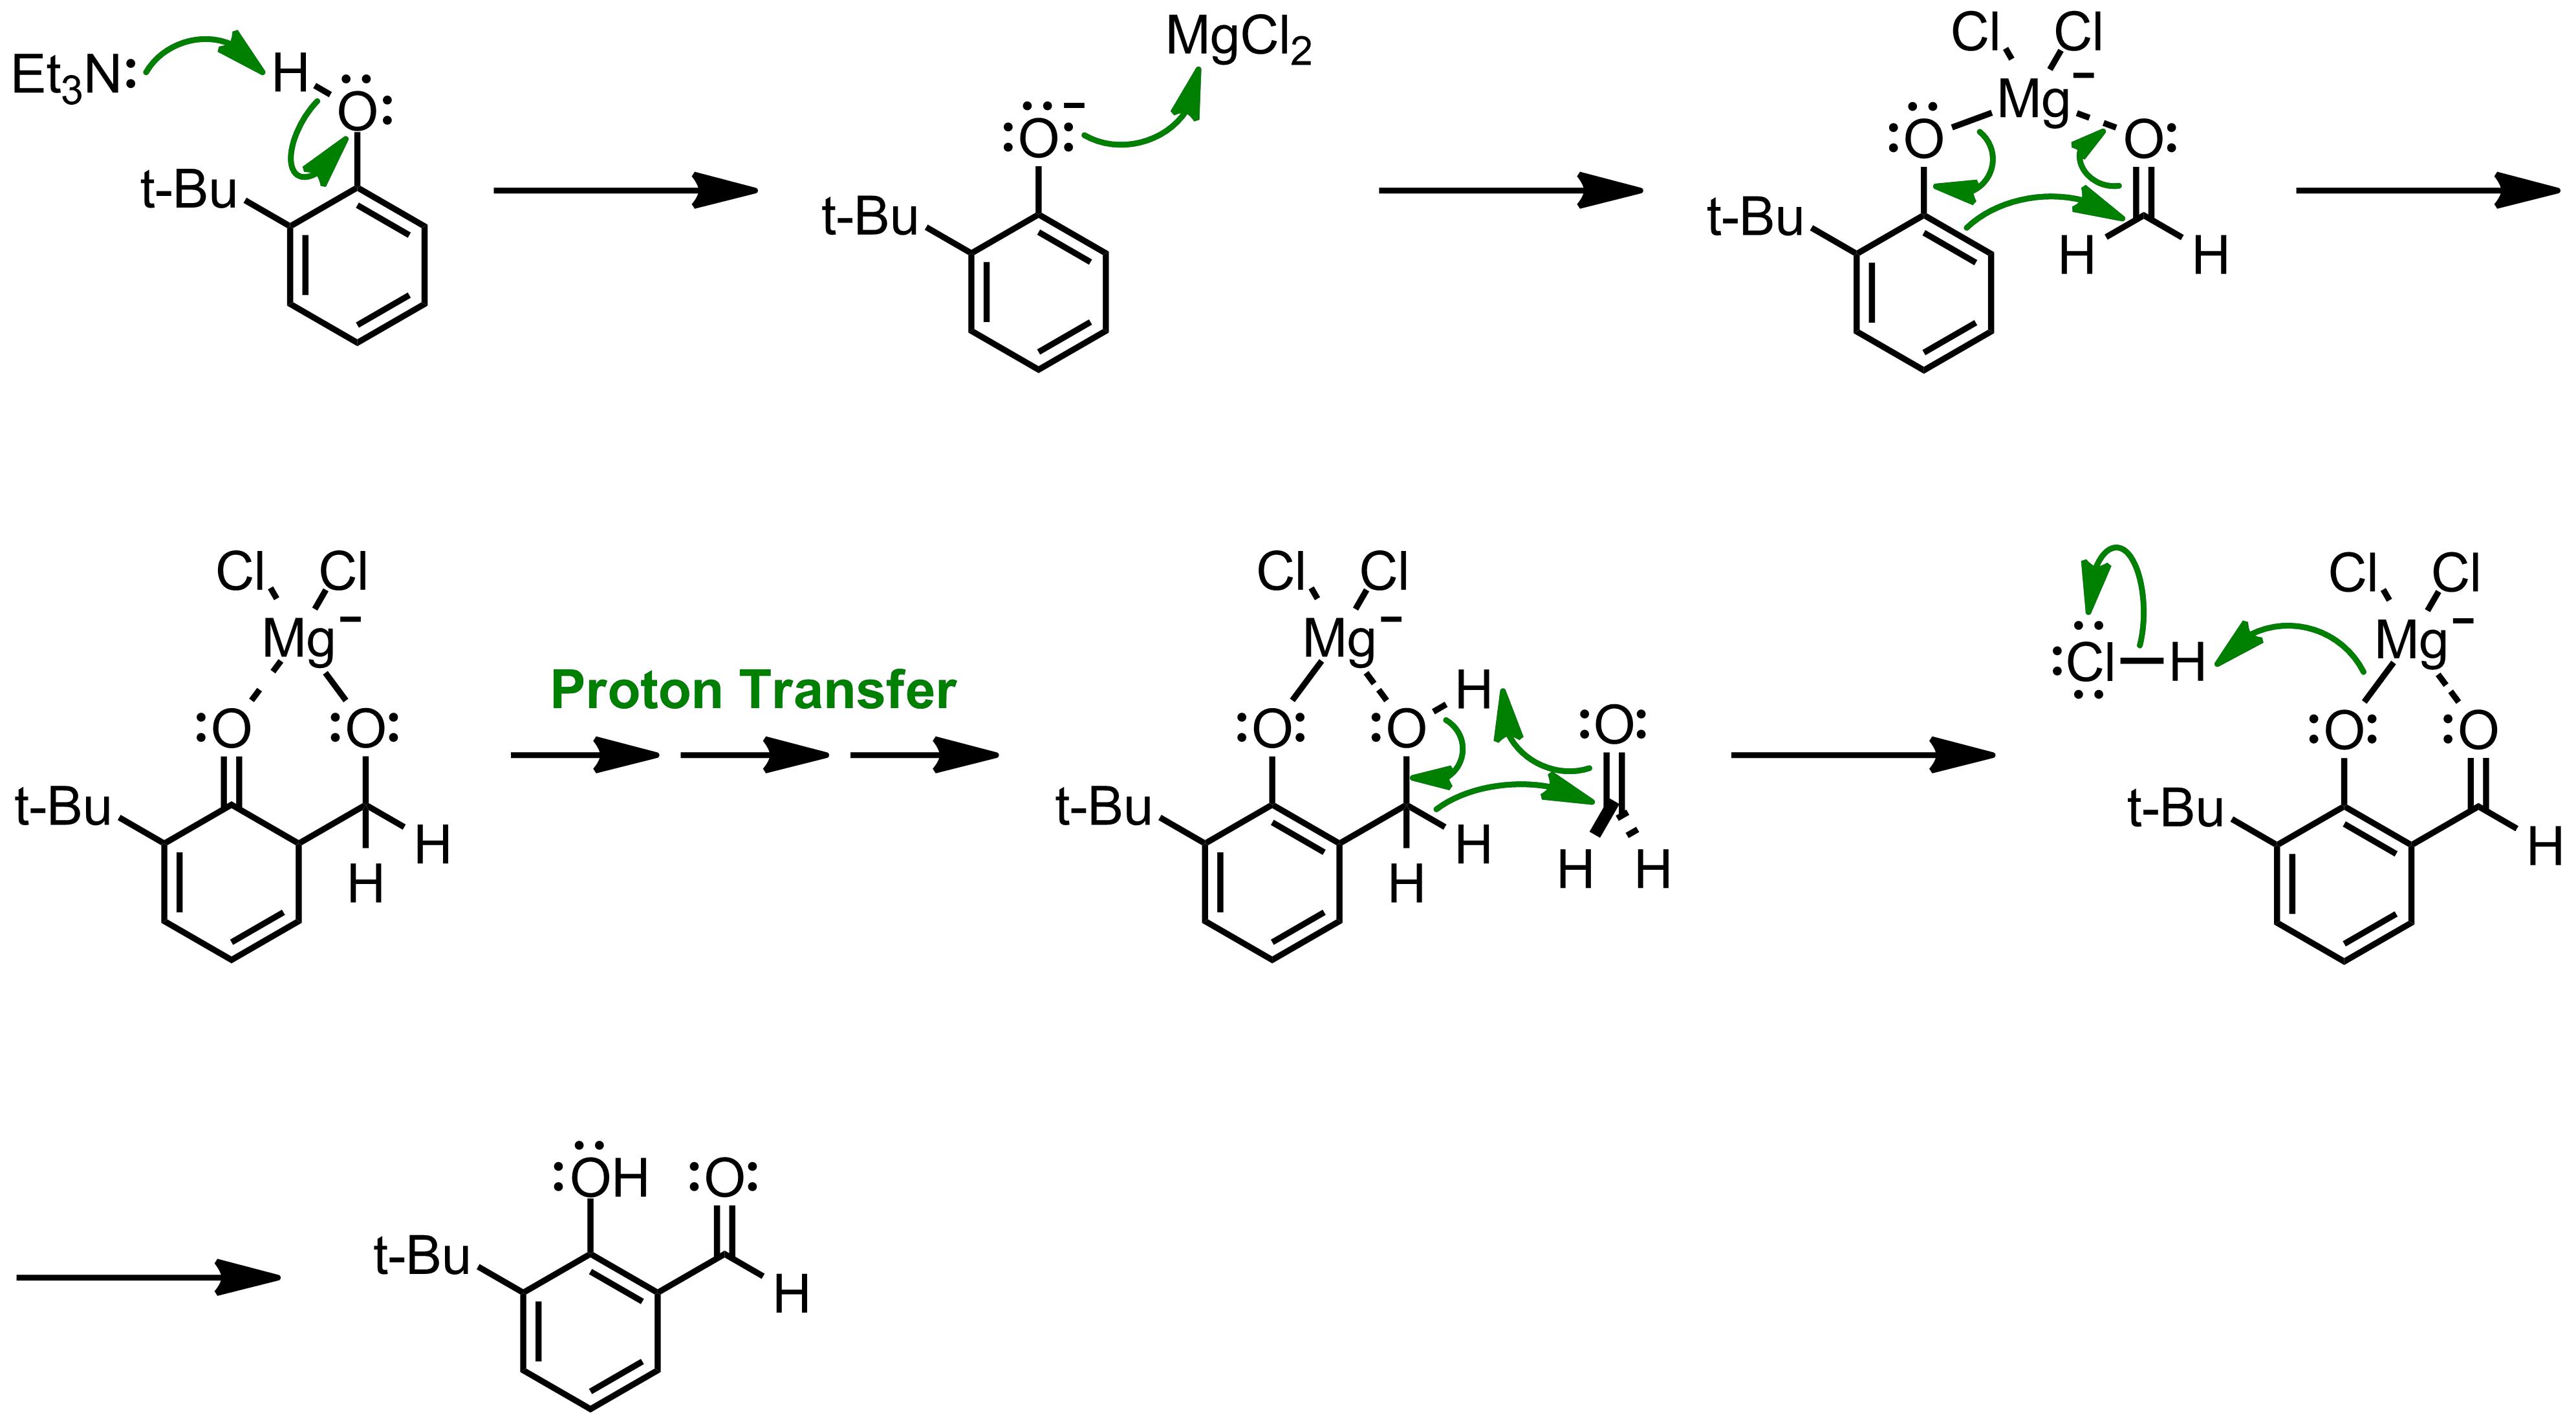 Mechanism of the Casnati-Skattebøl Formylation